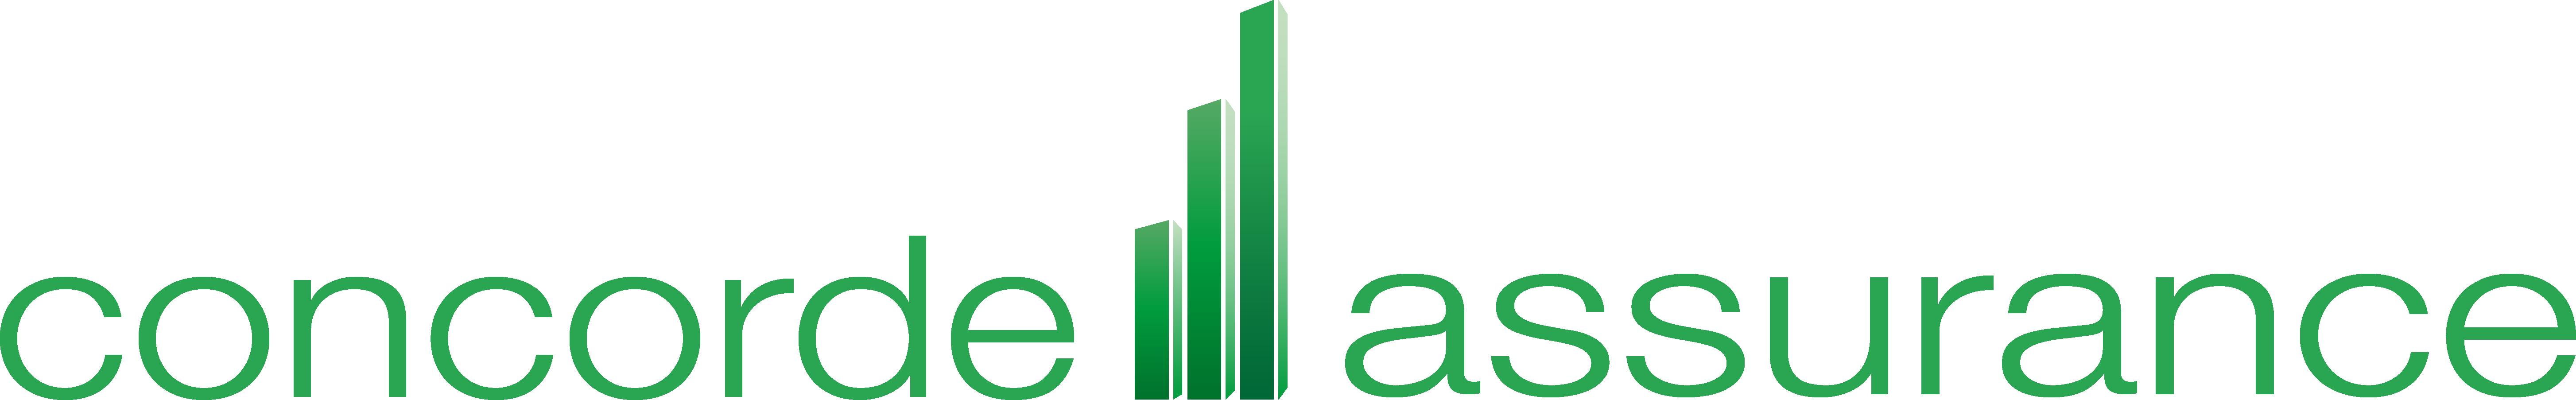 Logo Concorde Assurance